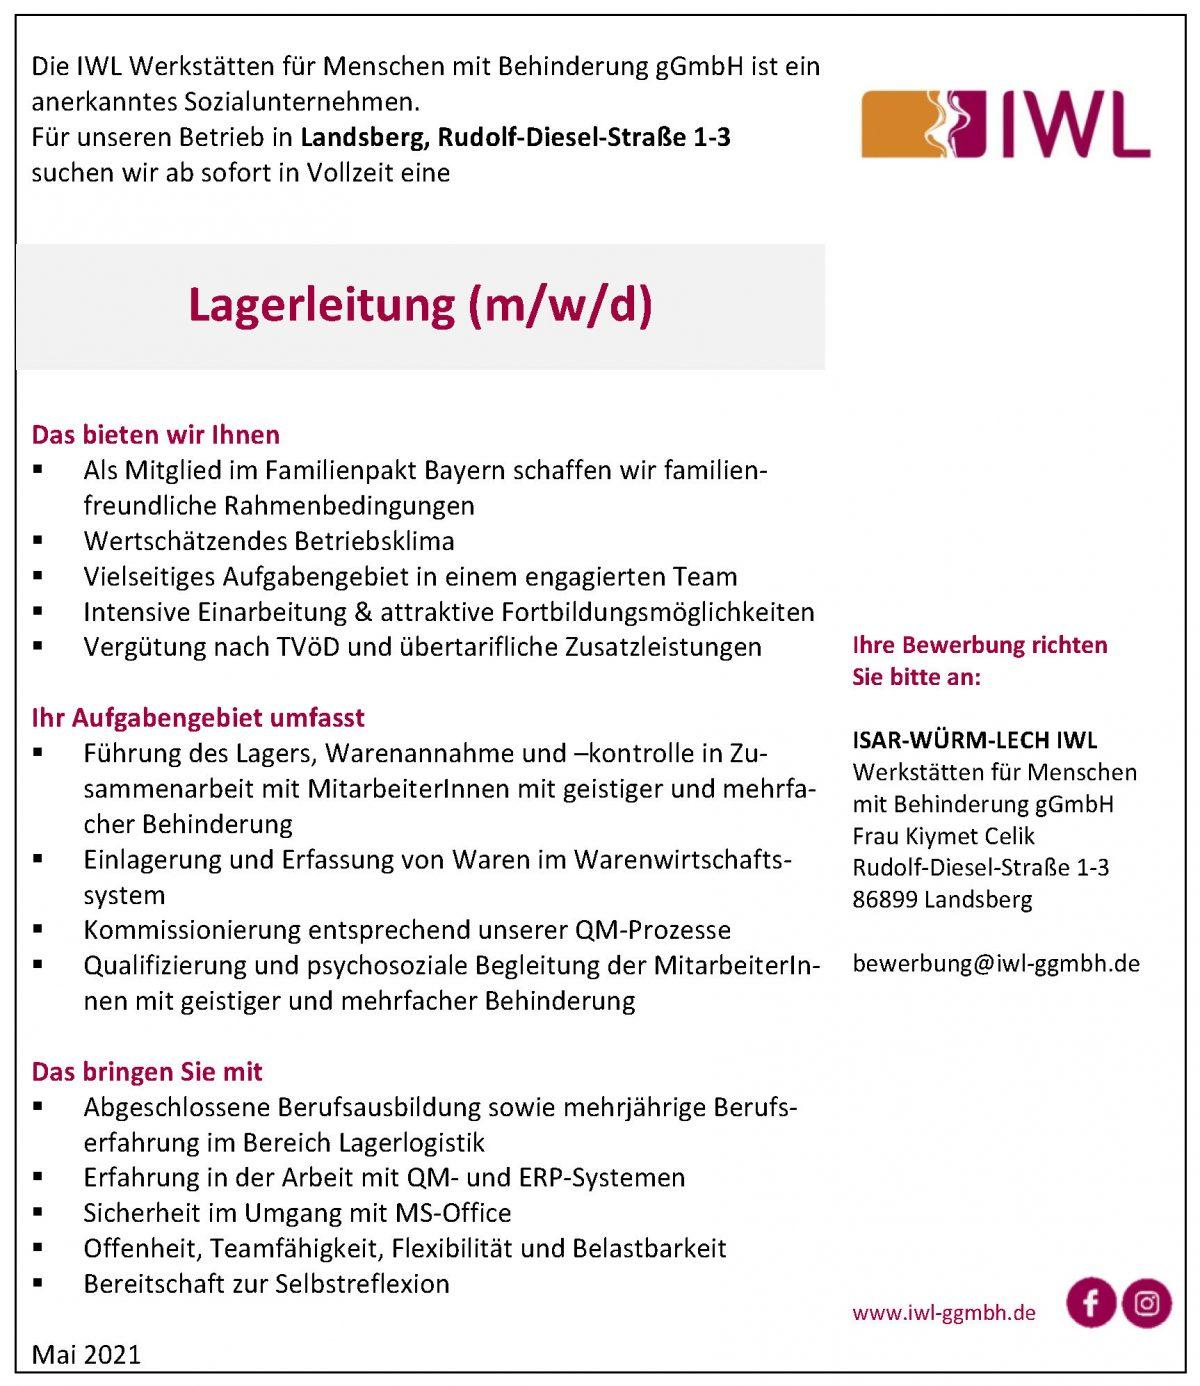 IWL Stellenangebot Lagerleitung in Vollzeit Landsberg am Lech